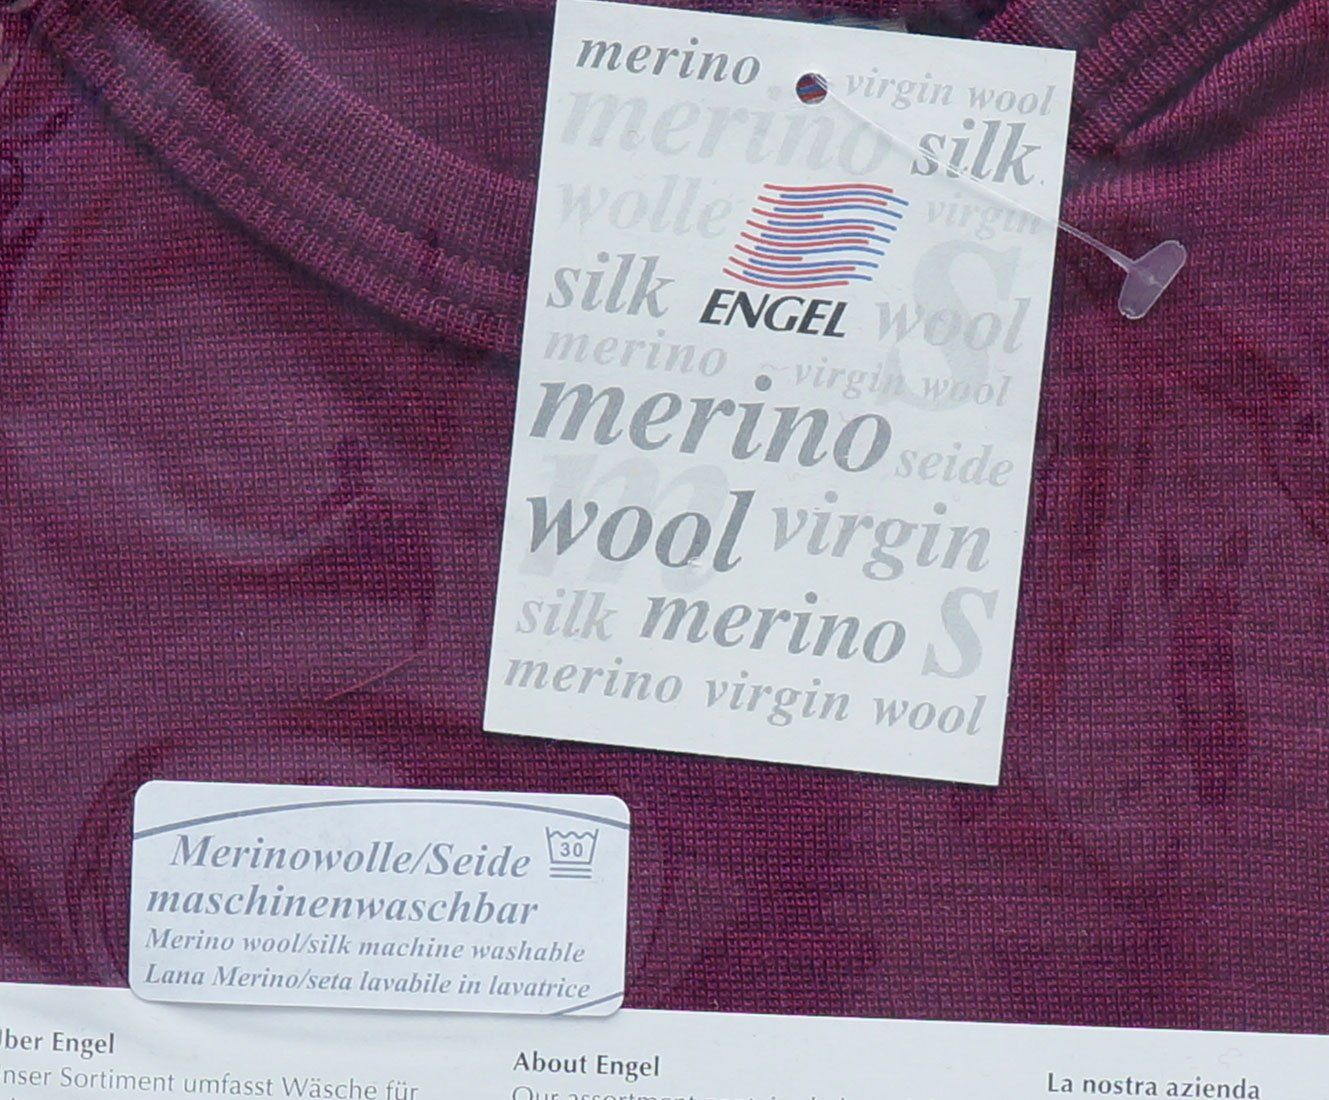 Engel Bodysuit Merino Wool Silk Baby Kids Body top Shirt Organic 70 9030